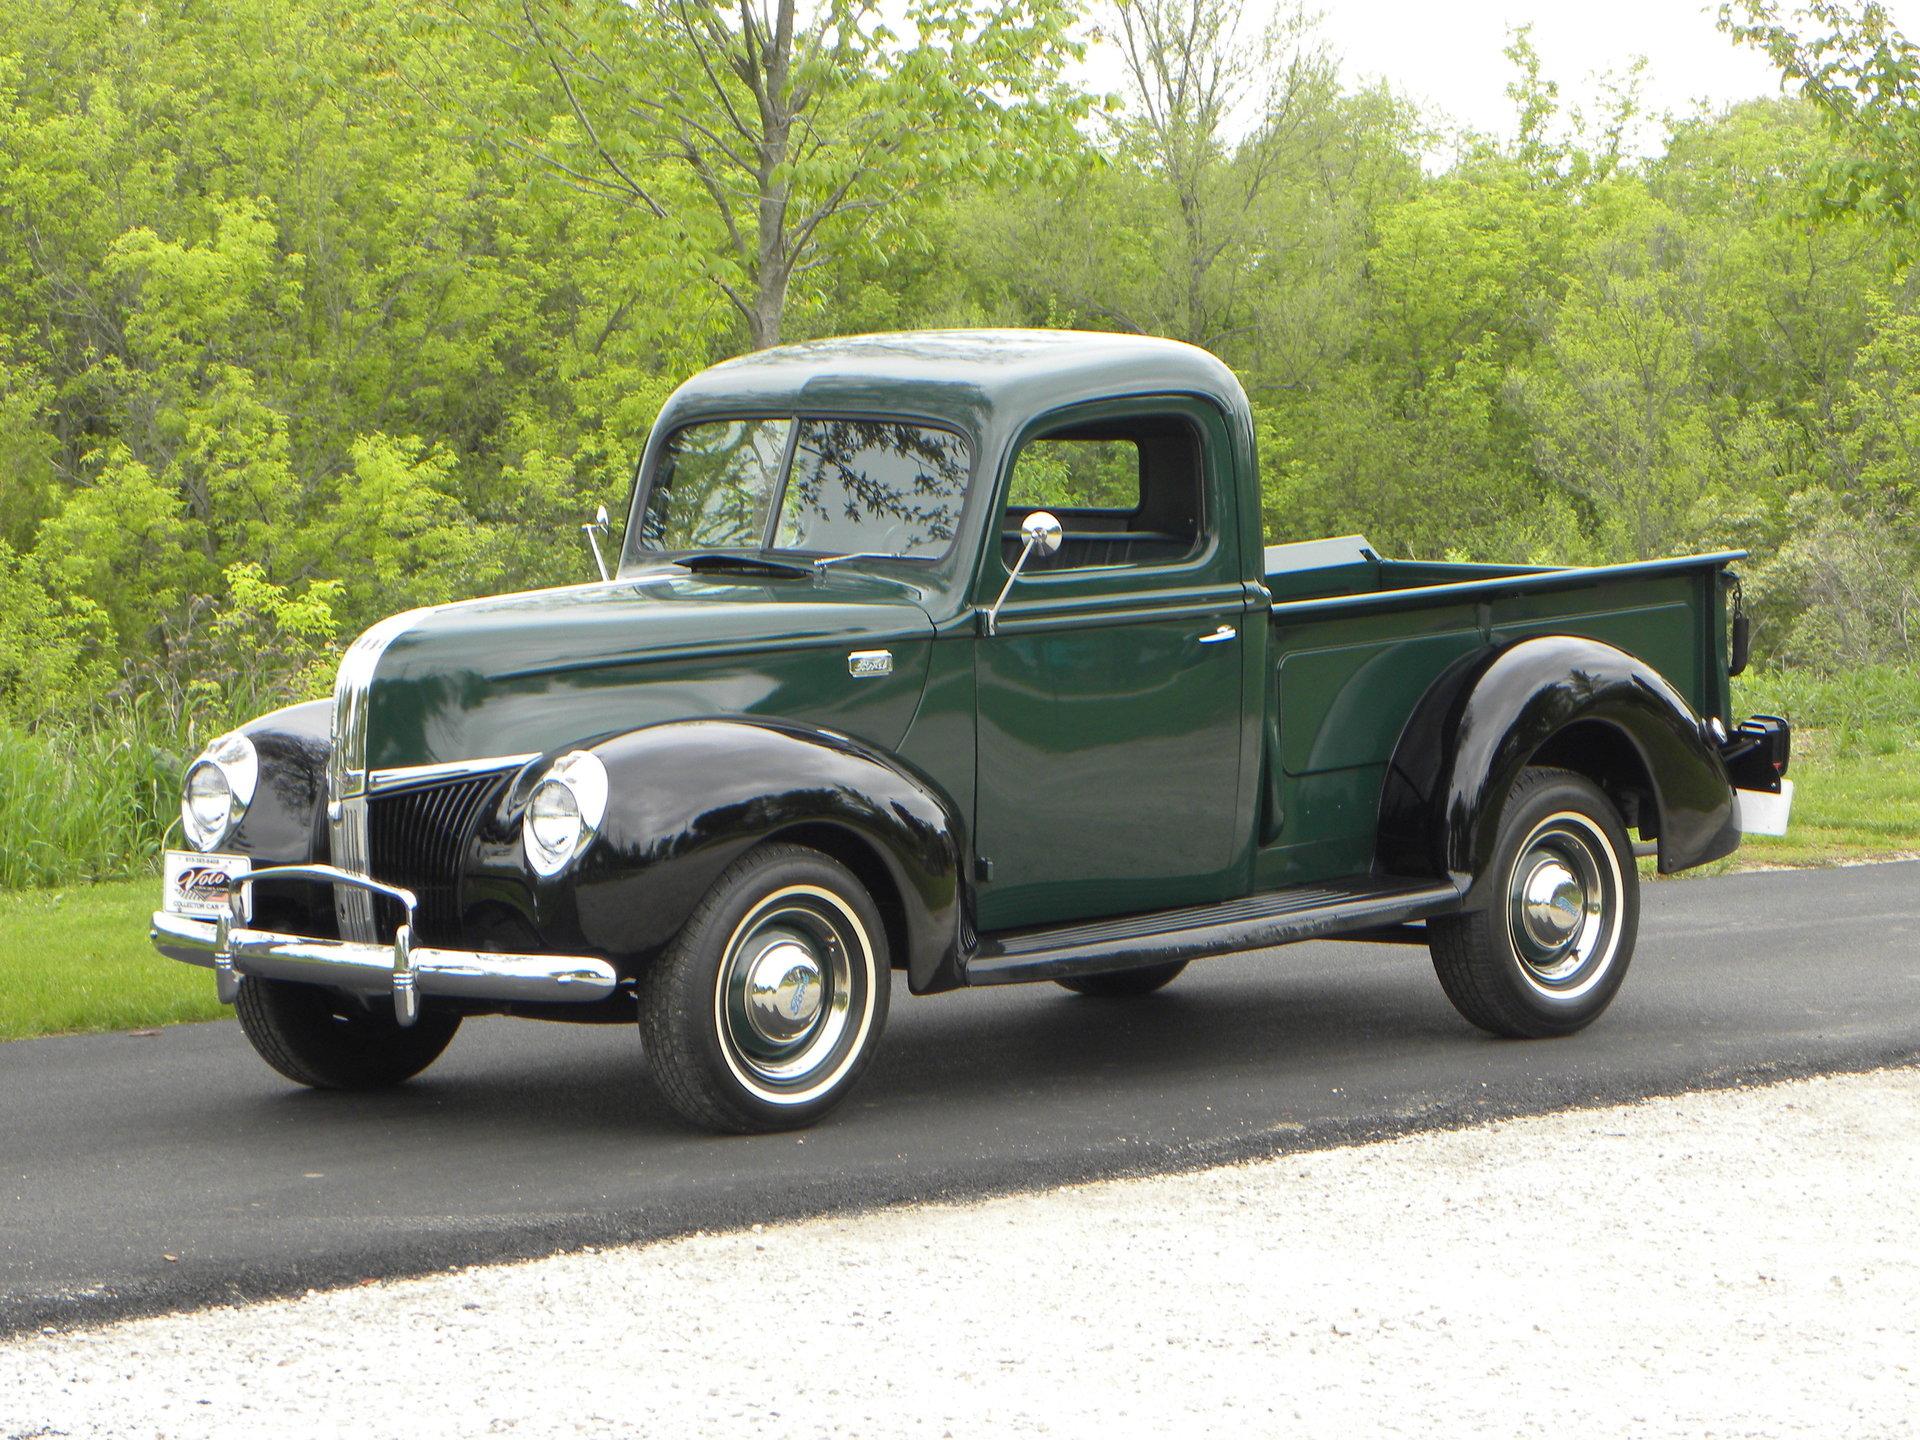 1941 Ford Models 11c Pickup Agcrewall 1 2 Ton Pick Up Model